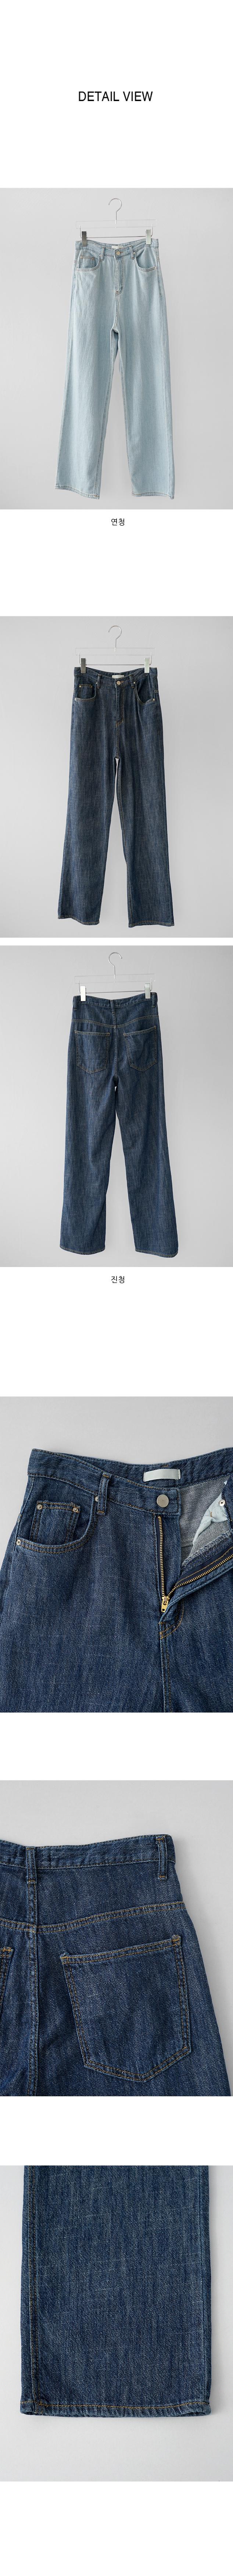 standard soft denim pants